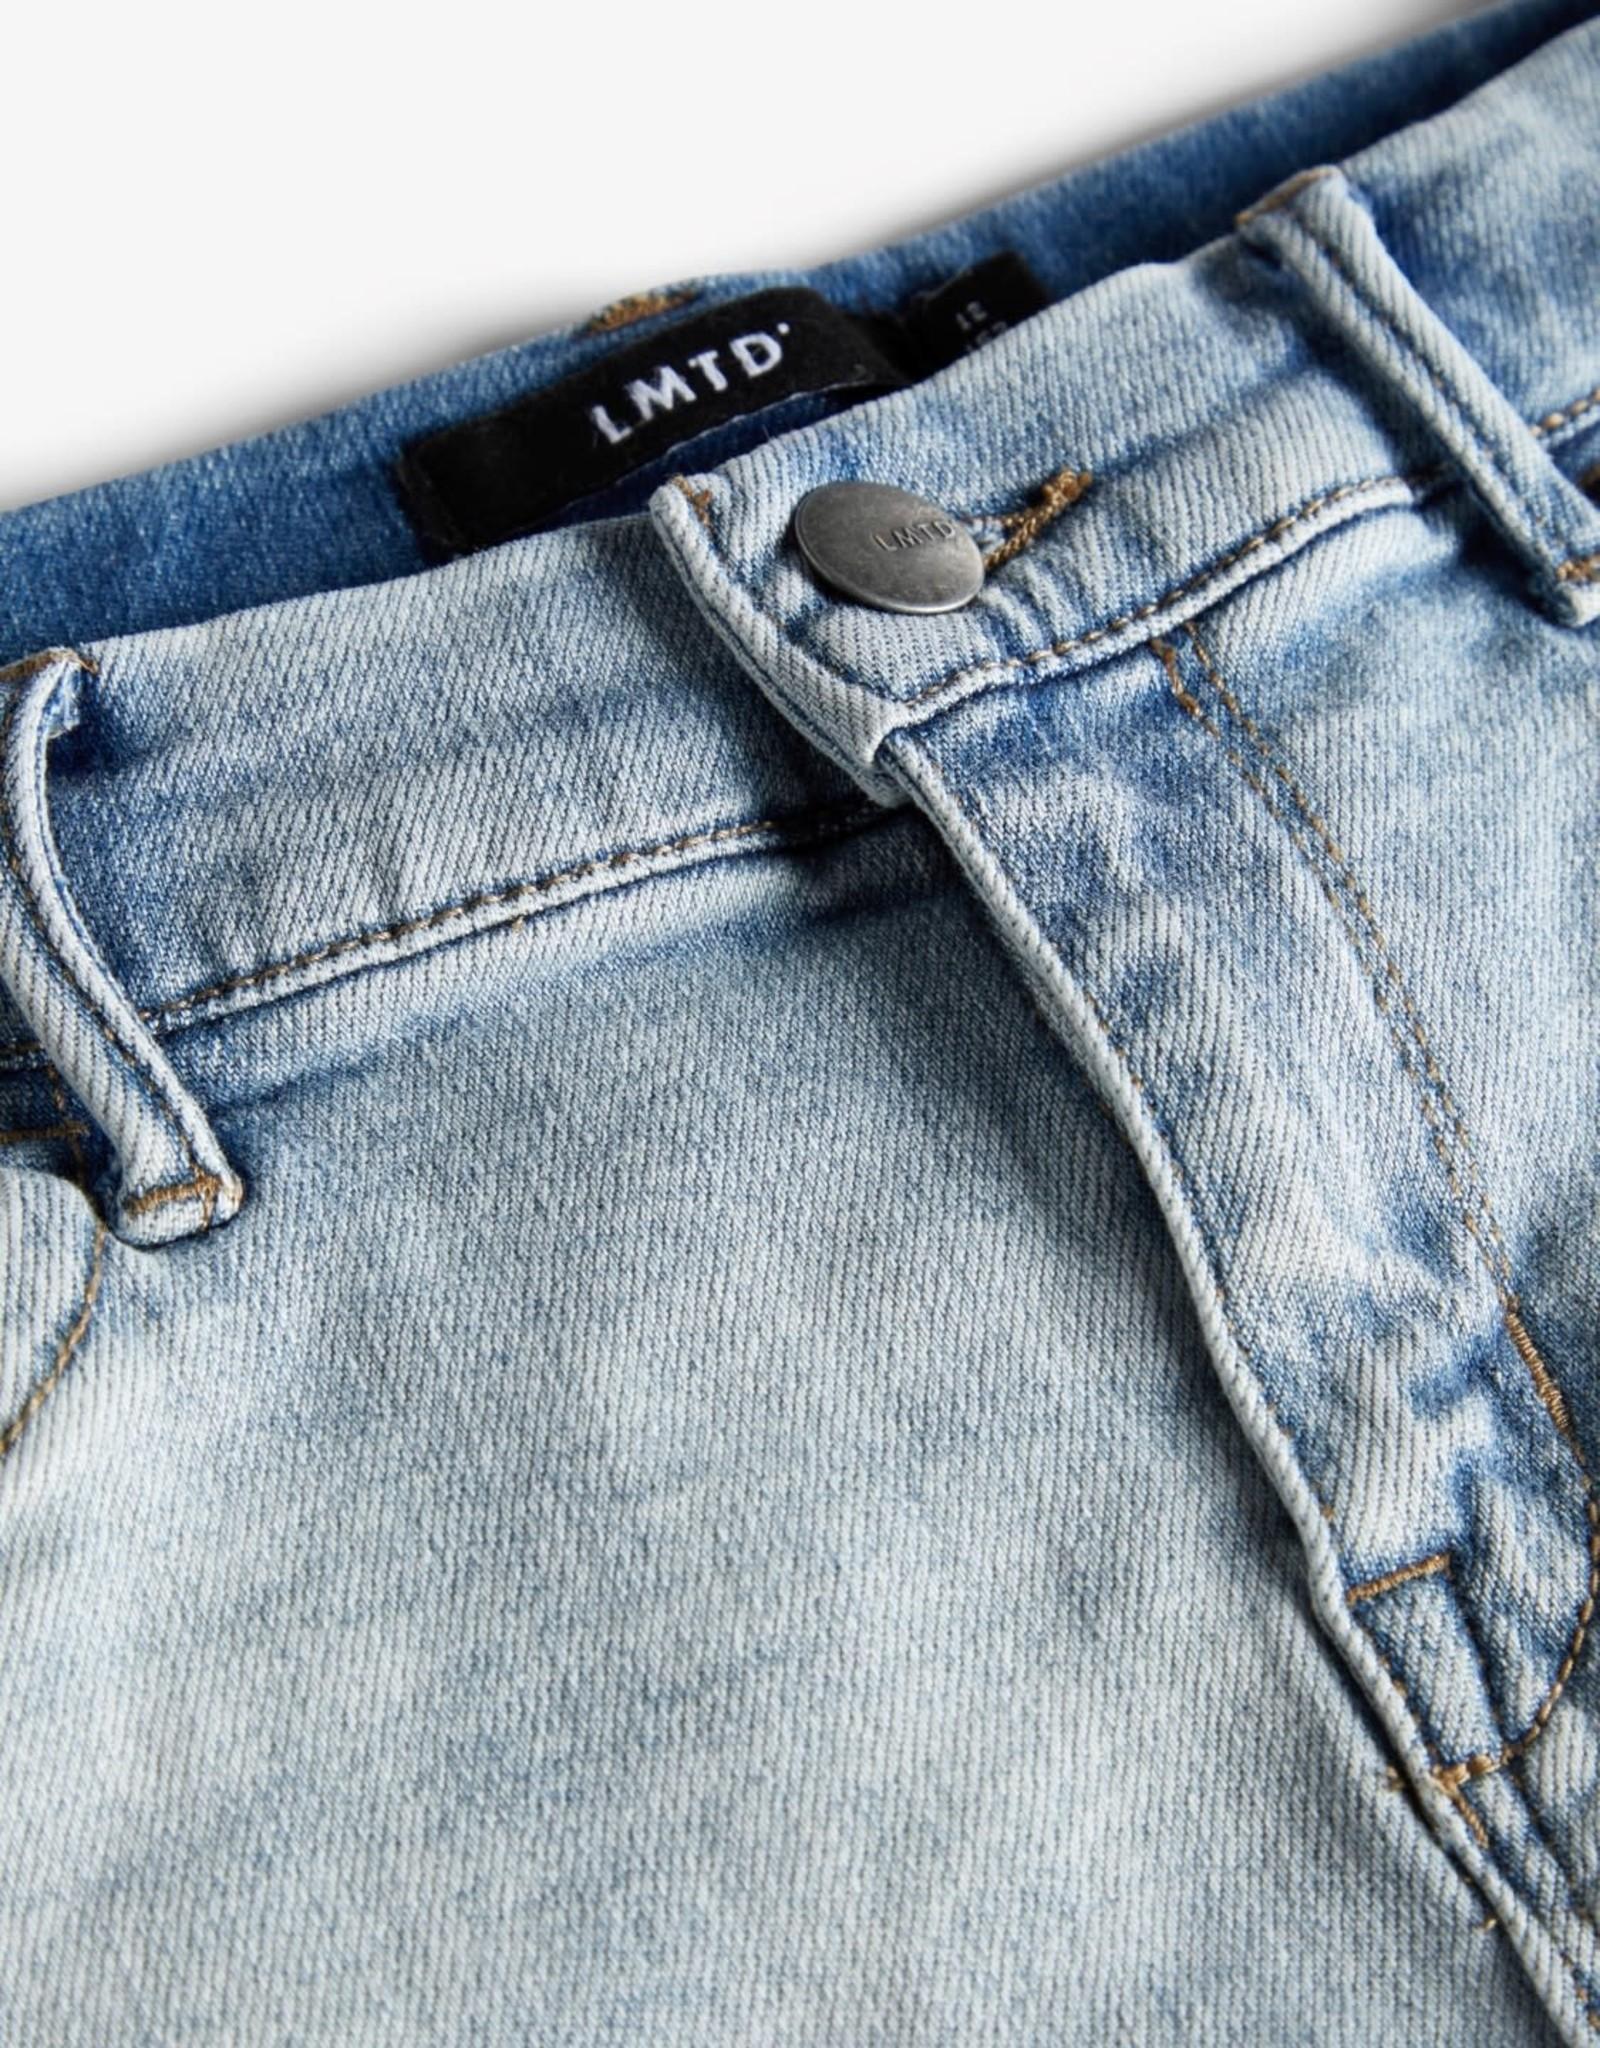 LMTD NLFSIW DNMTEM 1305 Skirt Noos